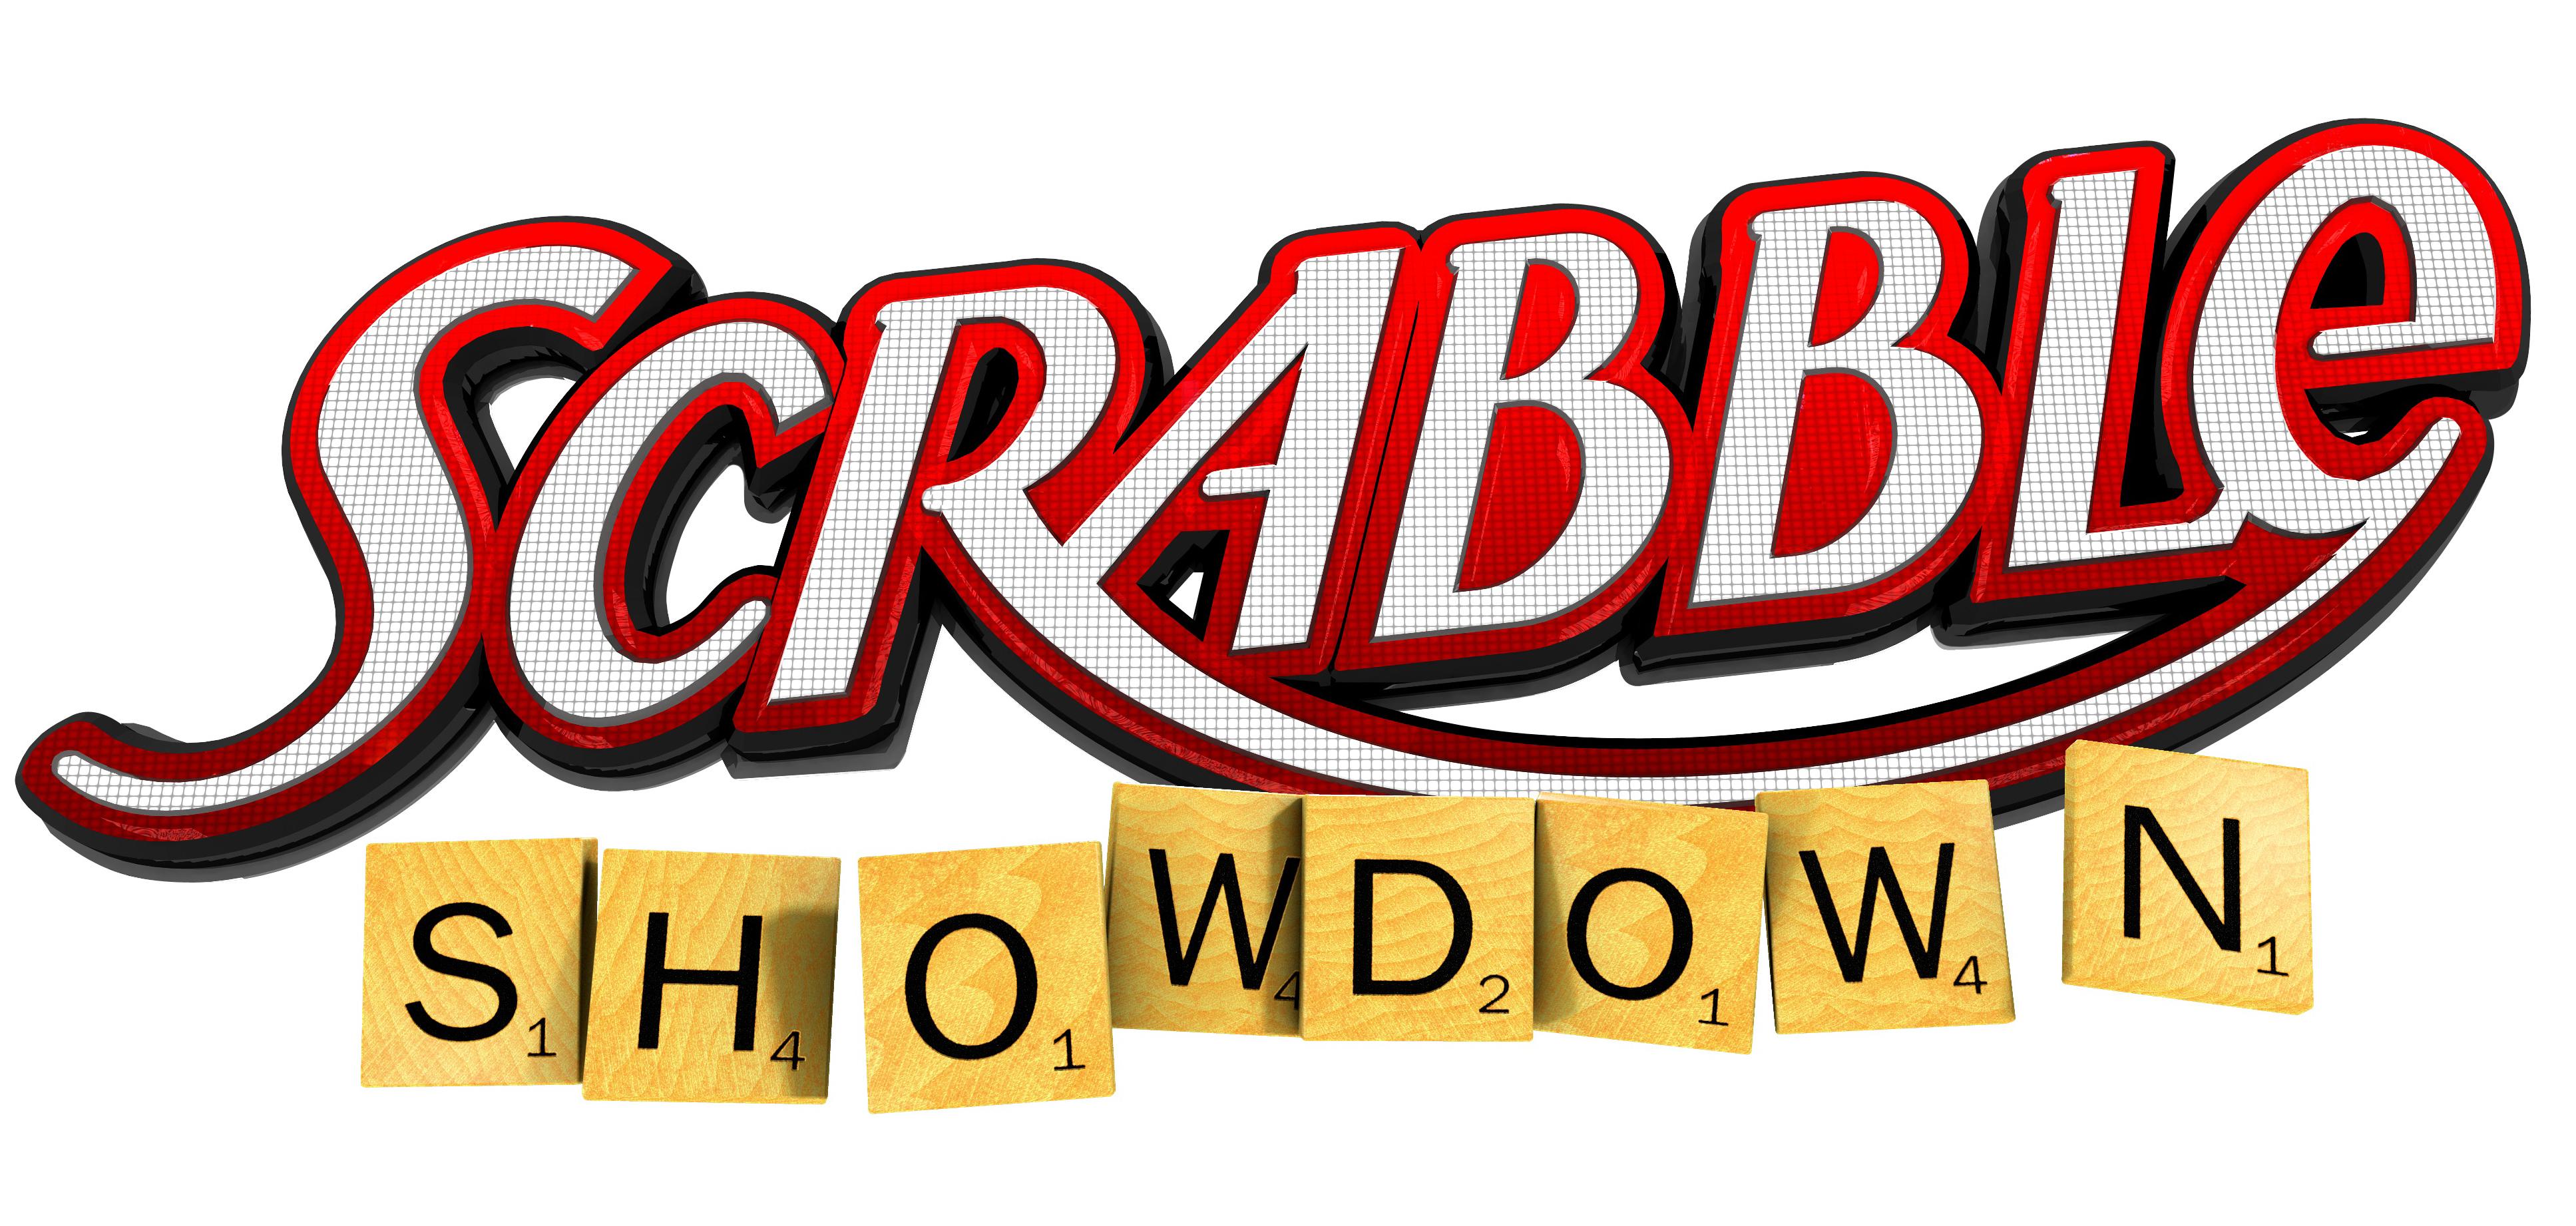 Scrabble clipart logo #14